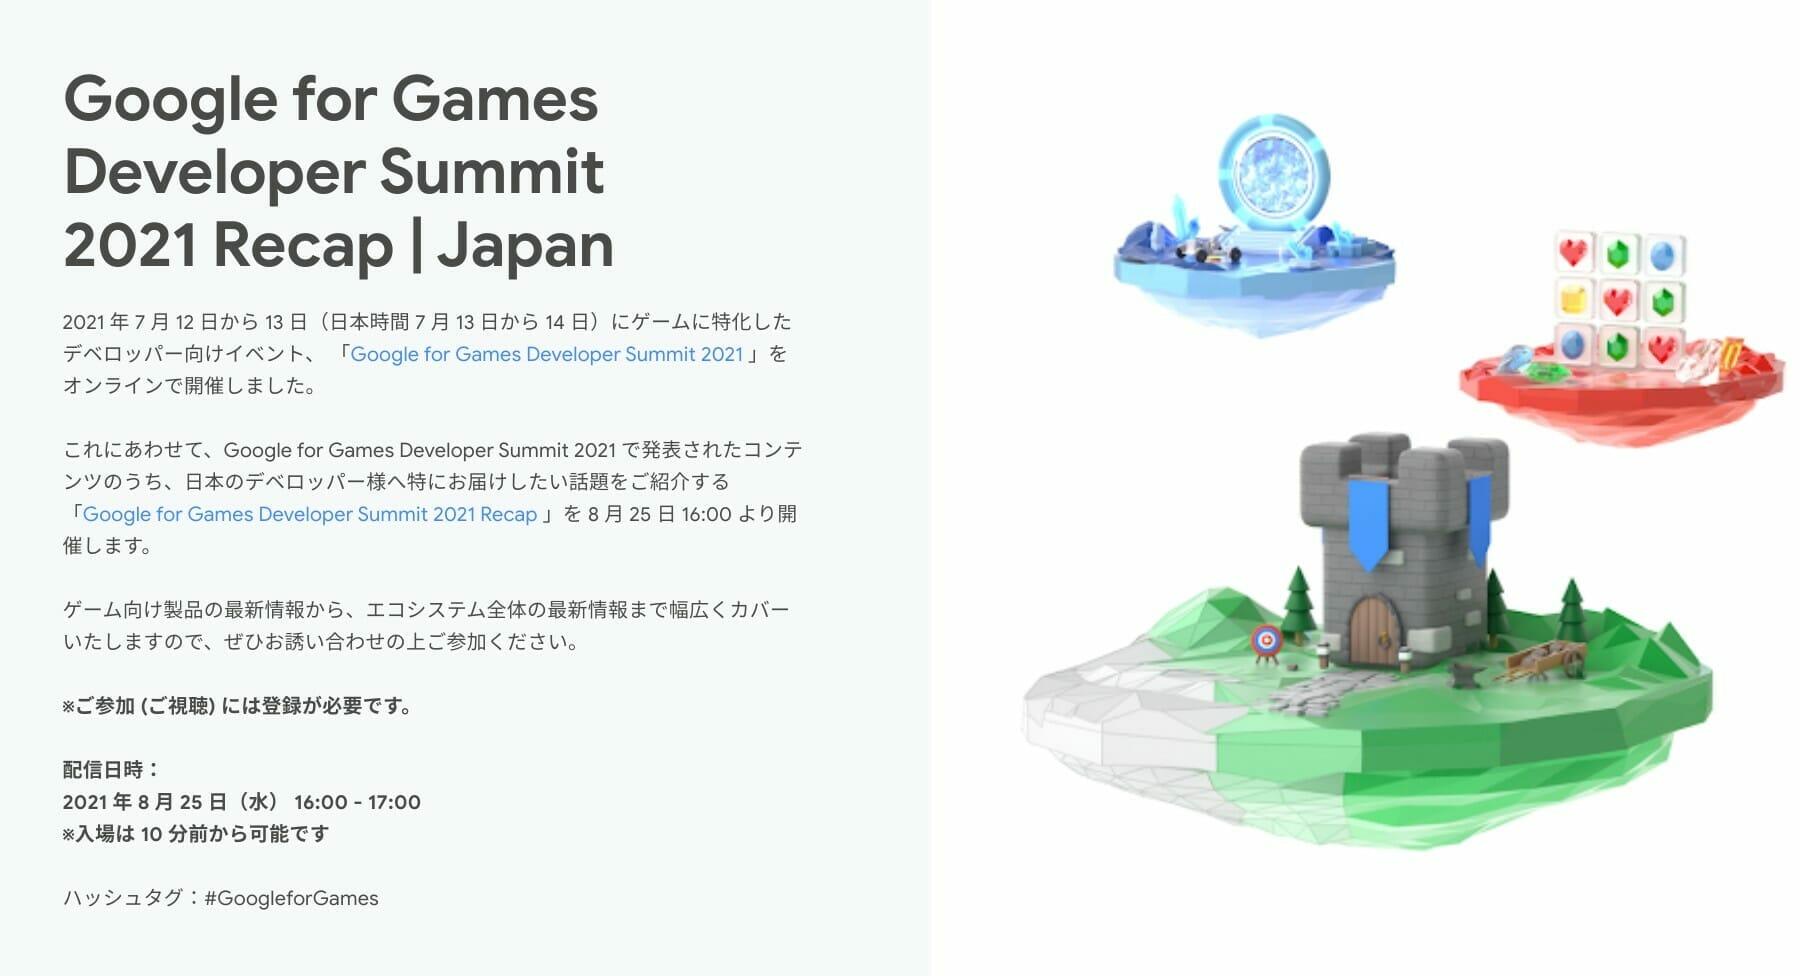 [GCP] Google for Games Developer Summit 2021 Recap | Japan